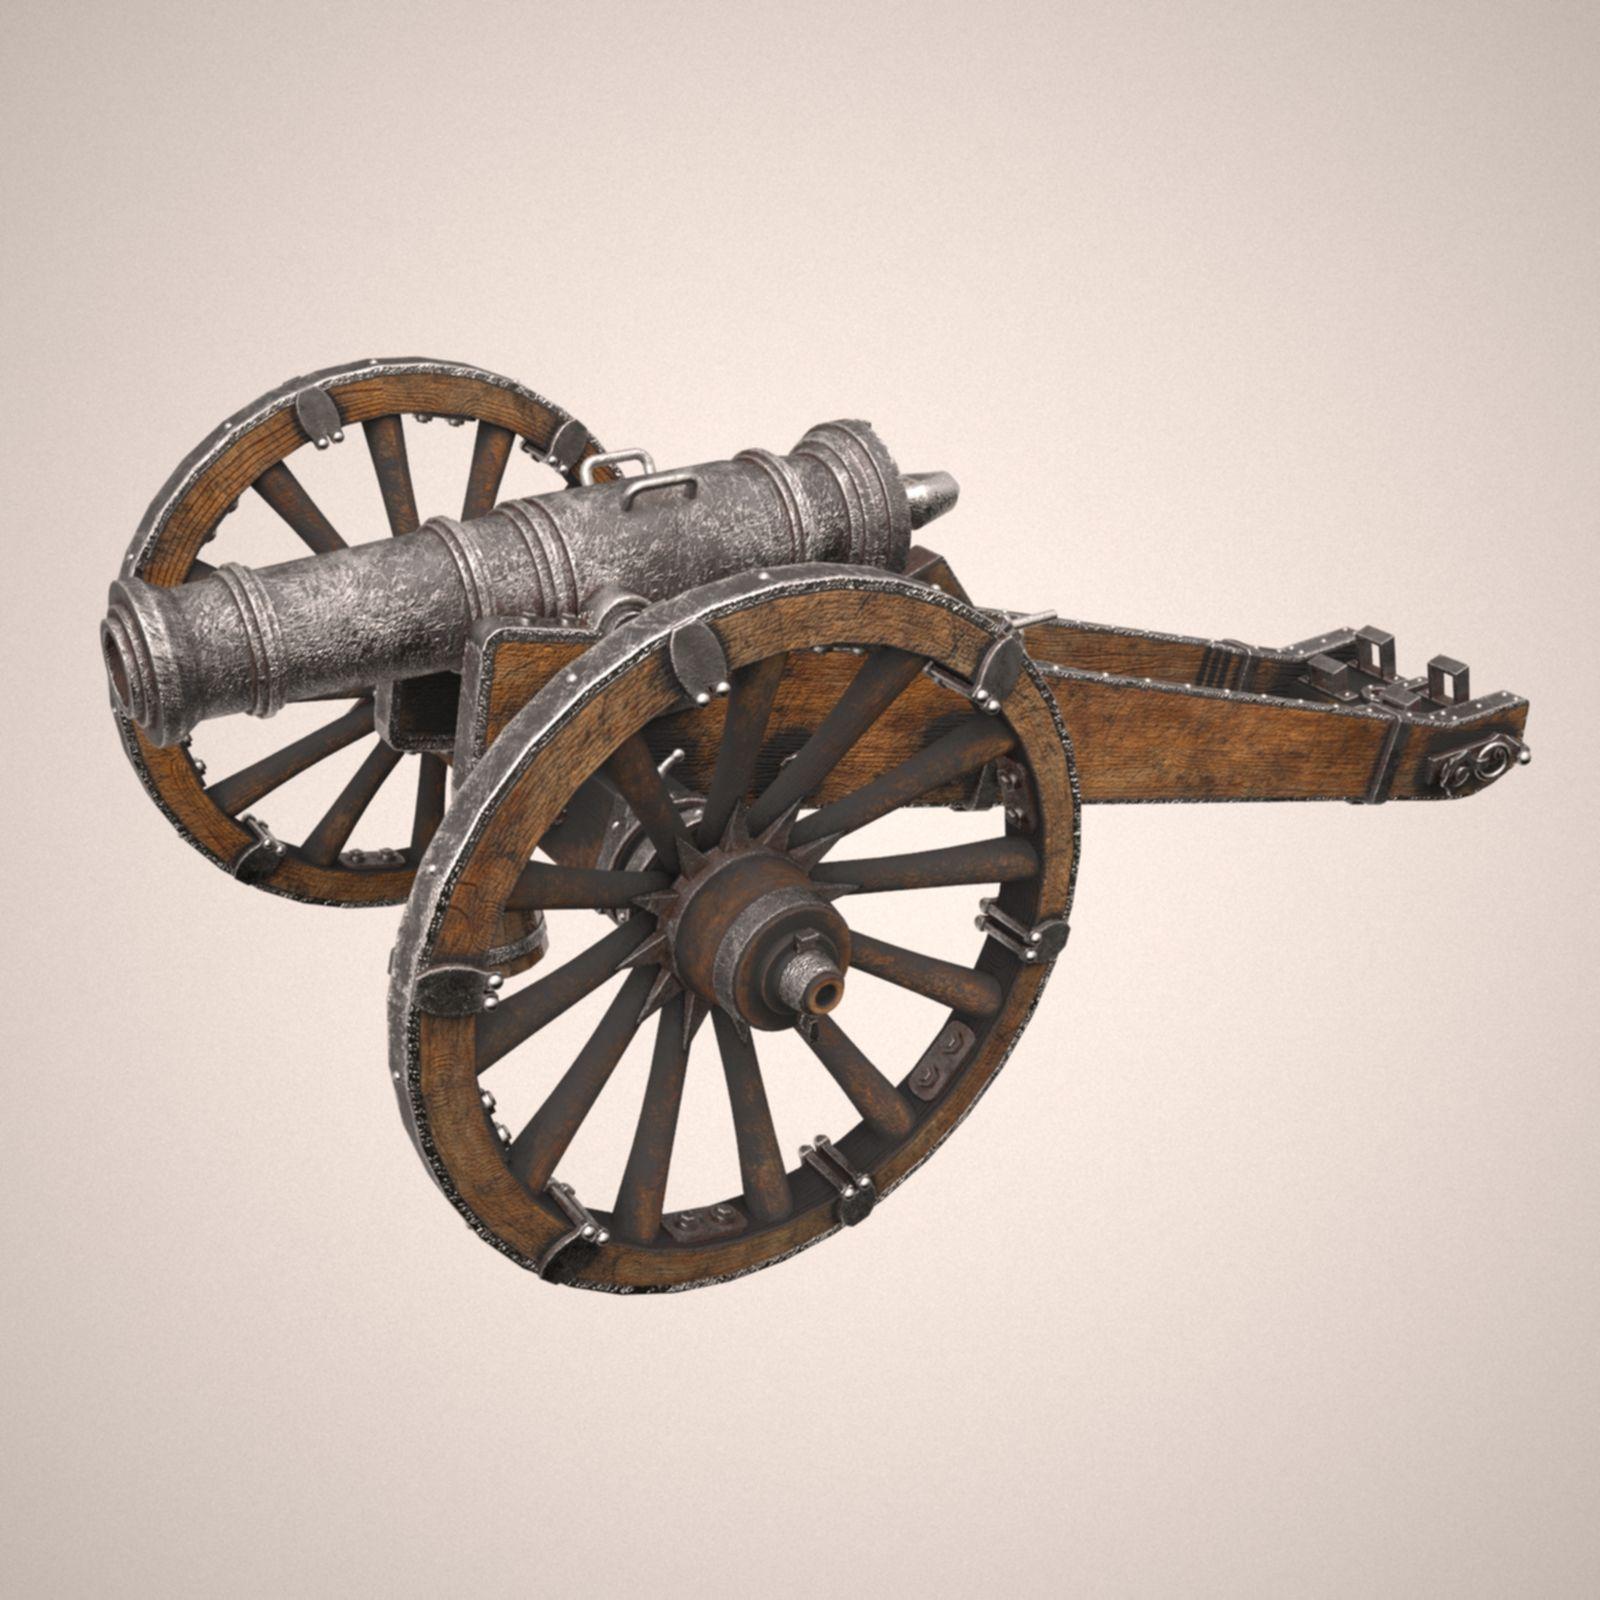 Cannon unicorn 3d model cannon 3d model model making